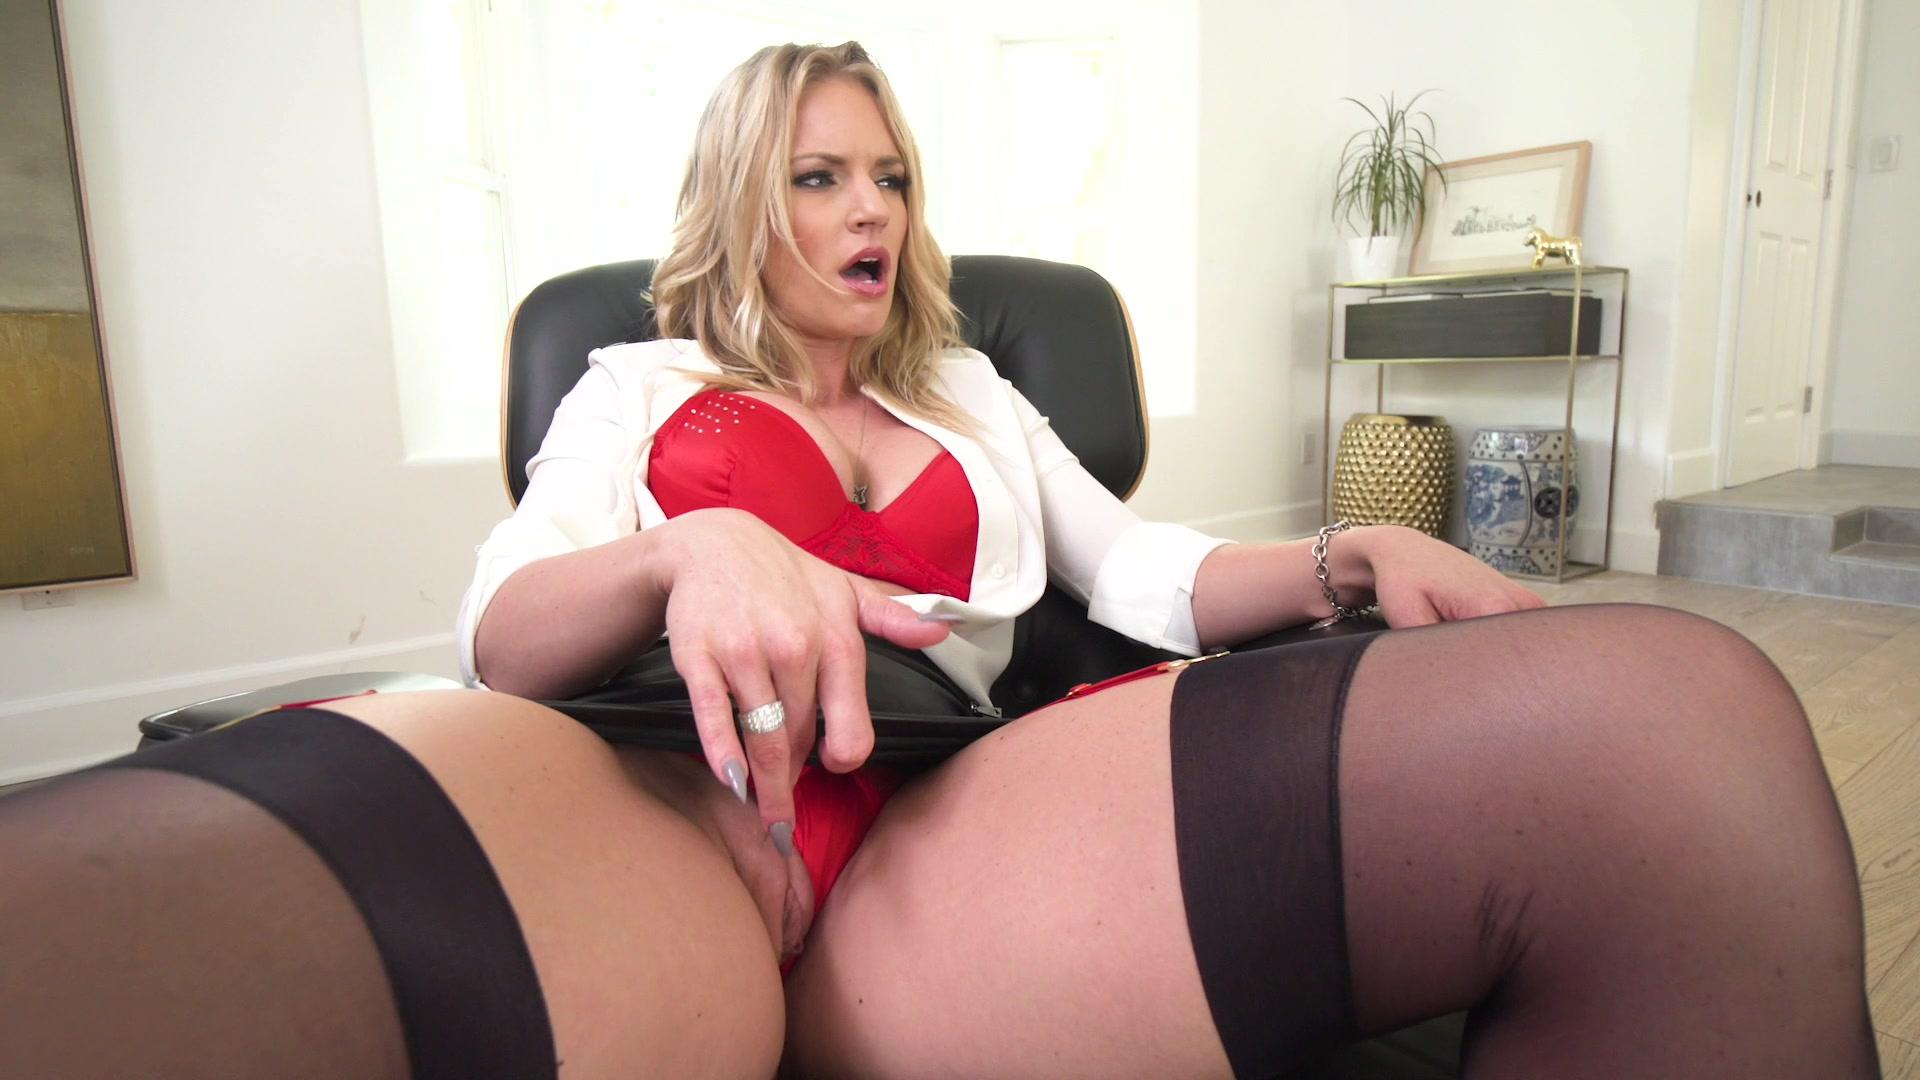 Busty milf rachel cavalli has nice pussy fucking pics full HD